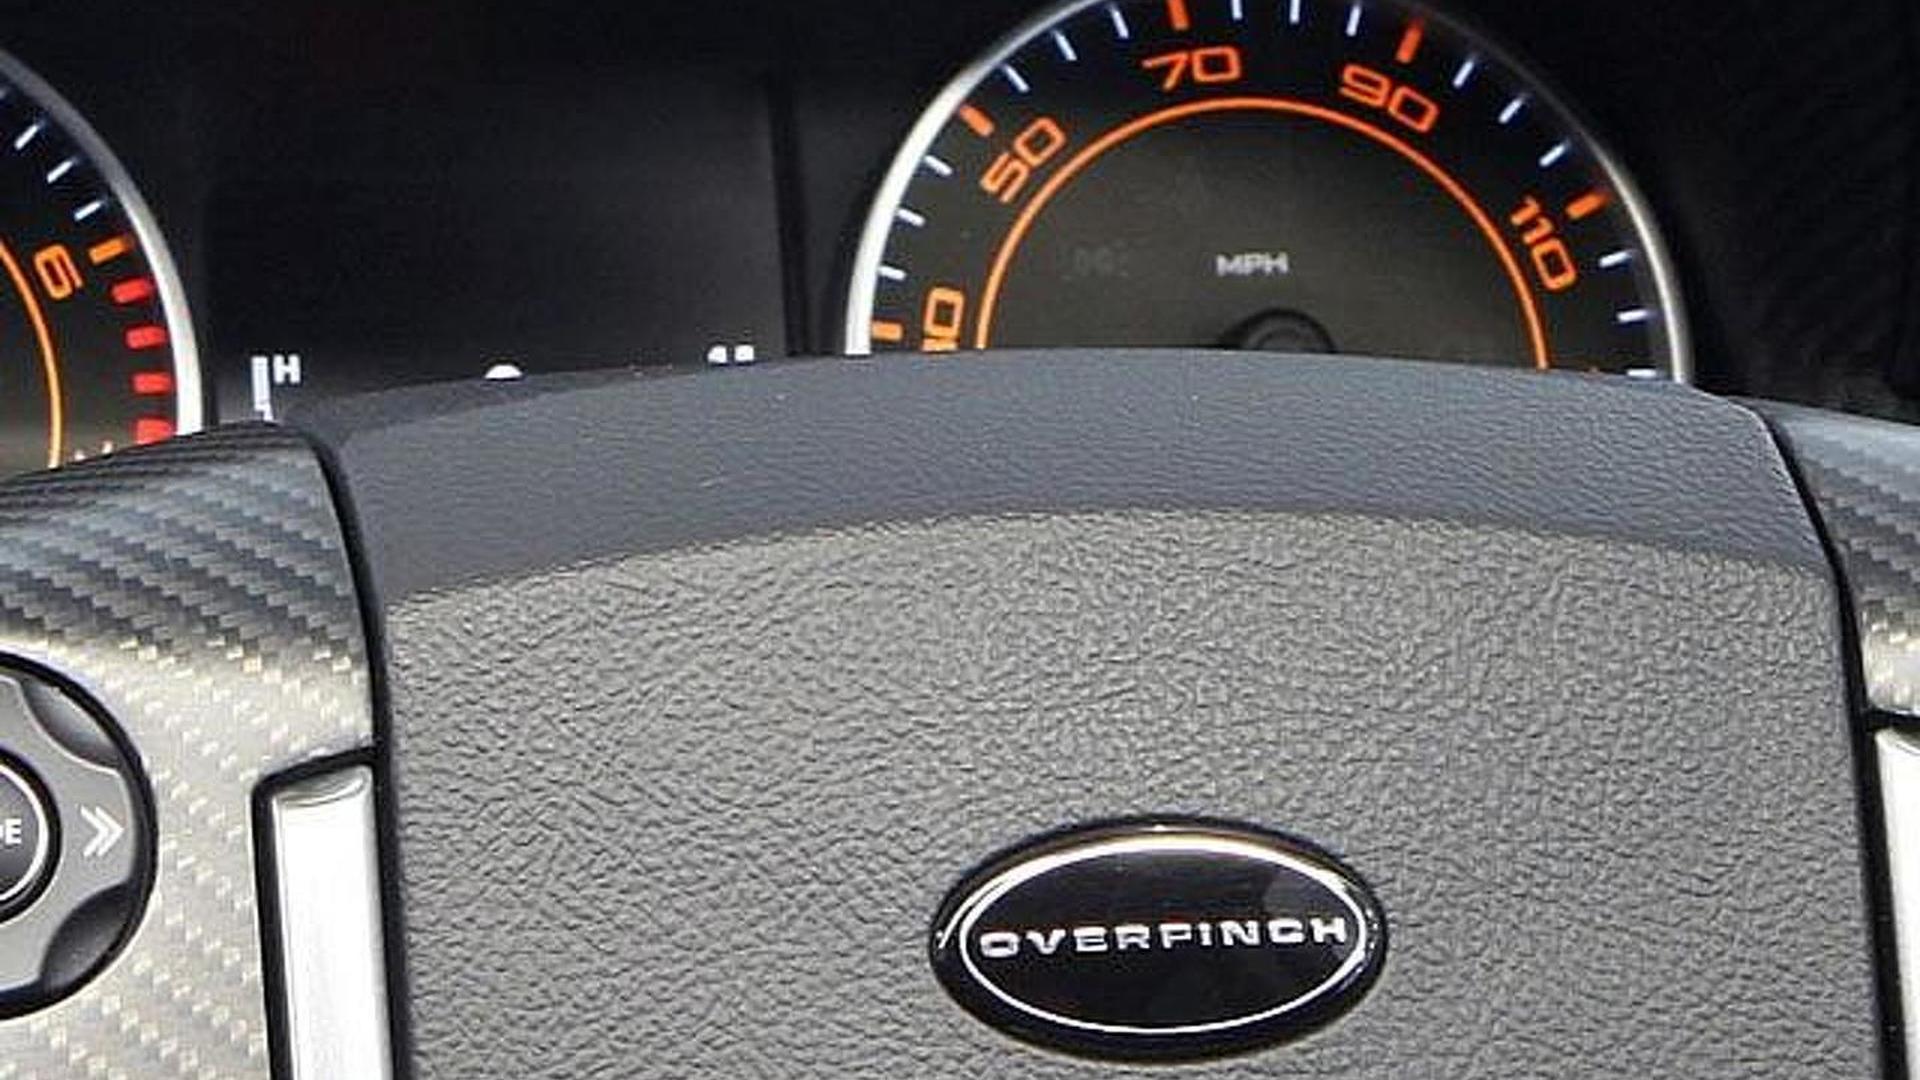 Overfinch Range Rover Sport GTS-X boasts 575 hp [video]